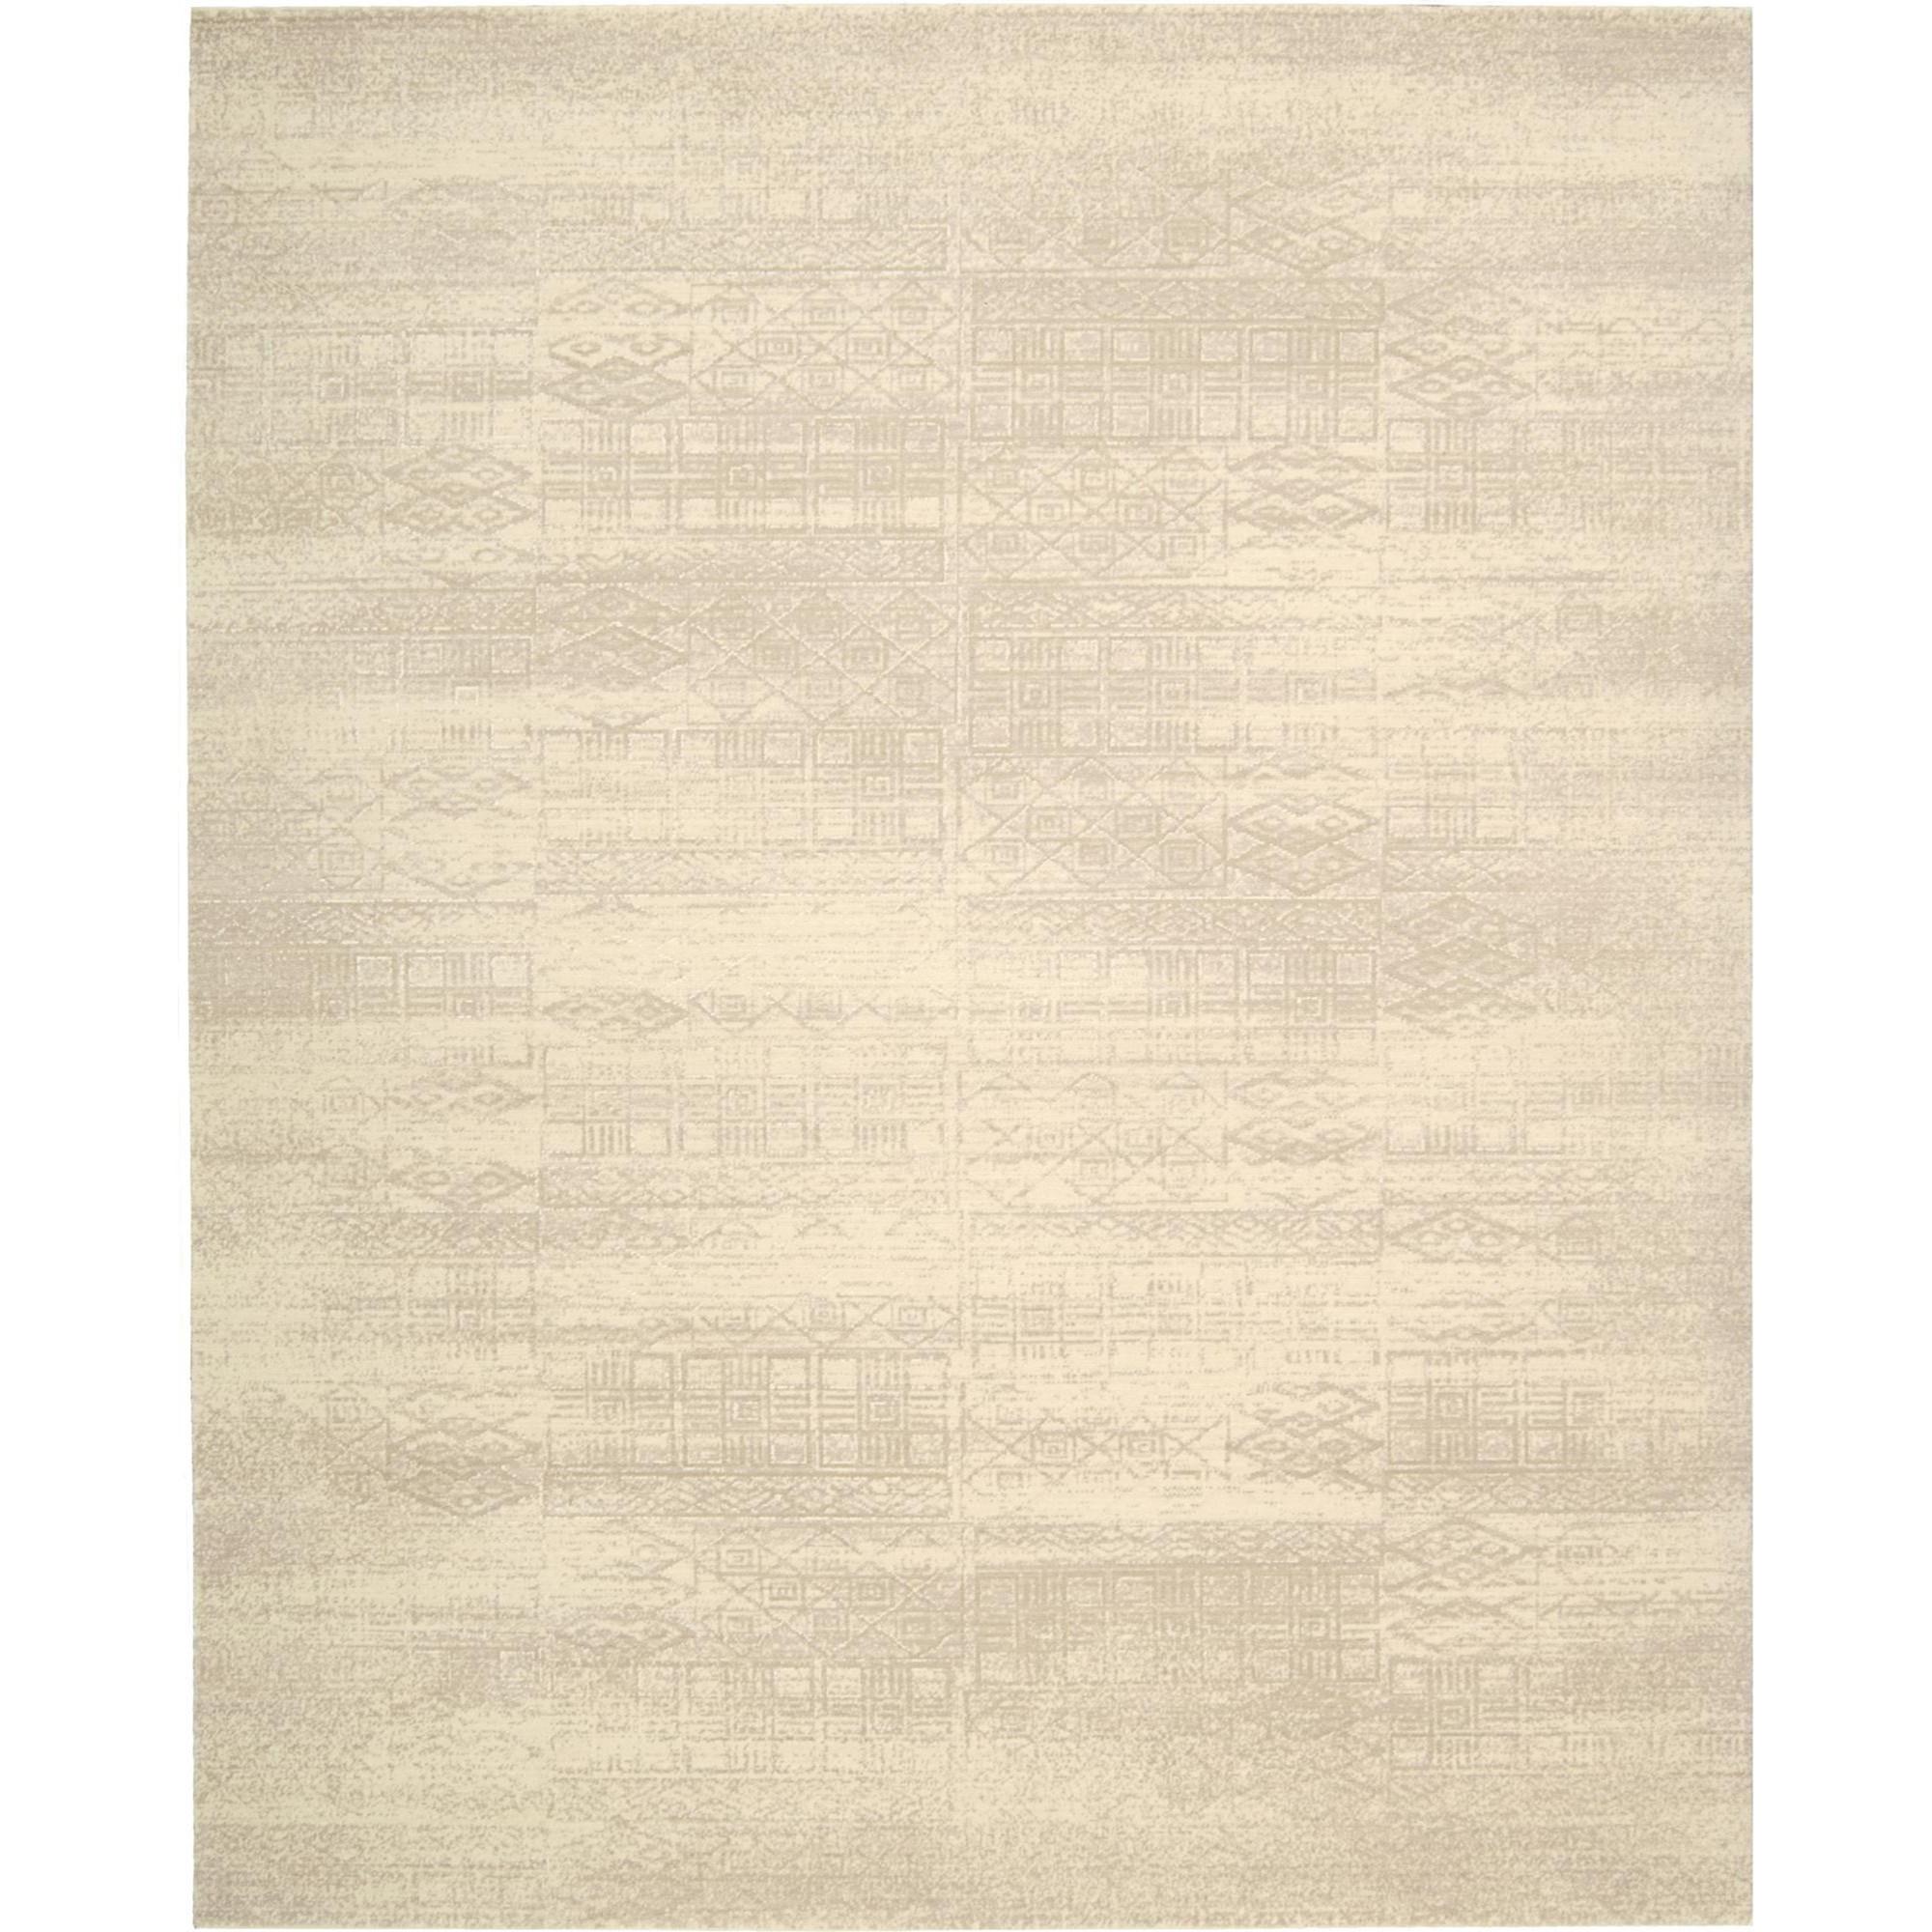 "Nourison Silk Elements 7'9"" x 9'9"" Bone Area Rug - Item Number: 29540"